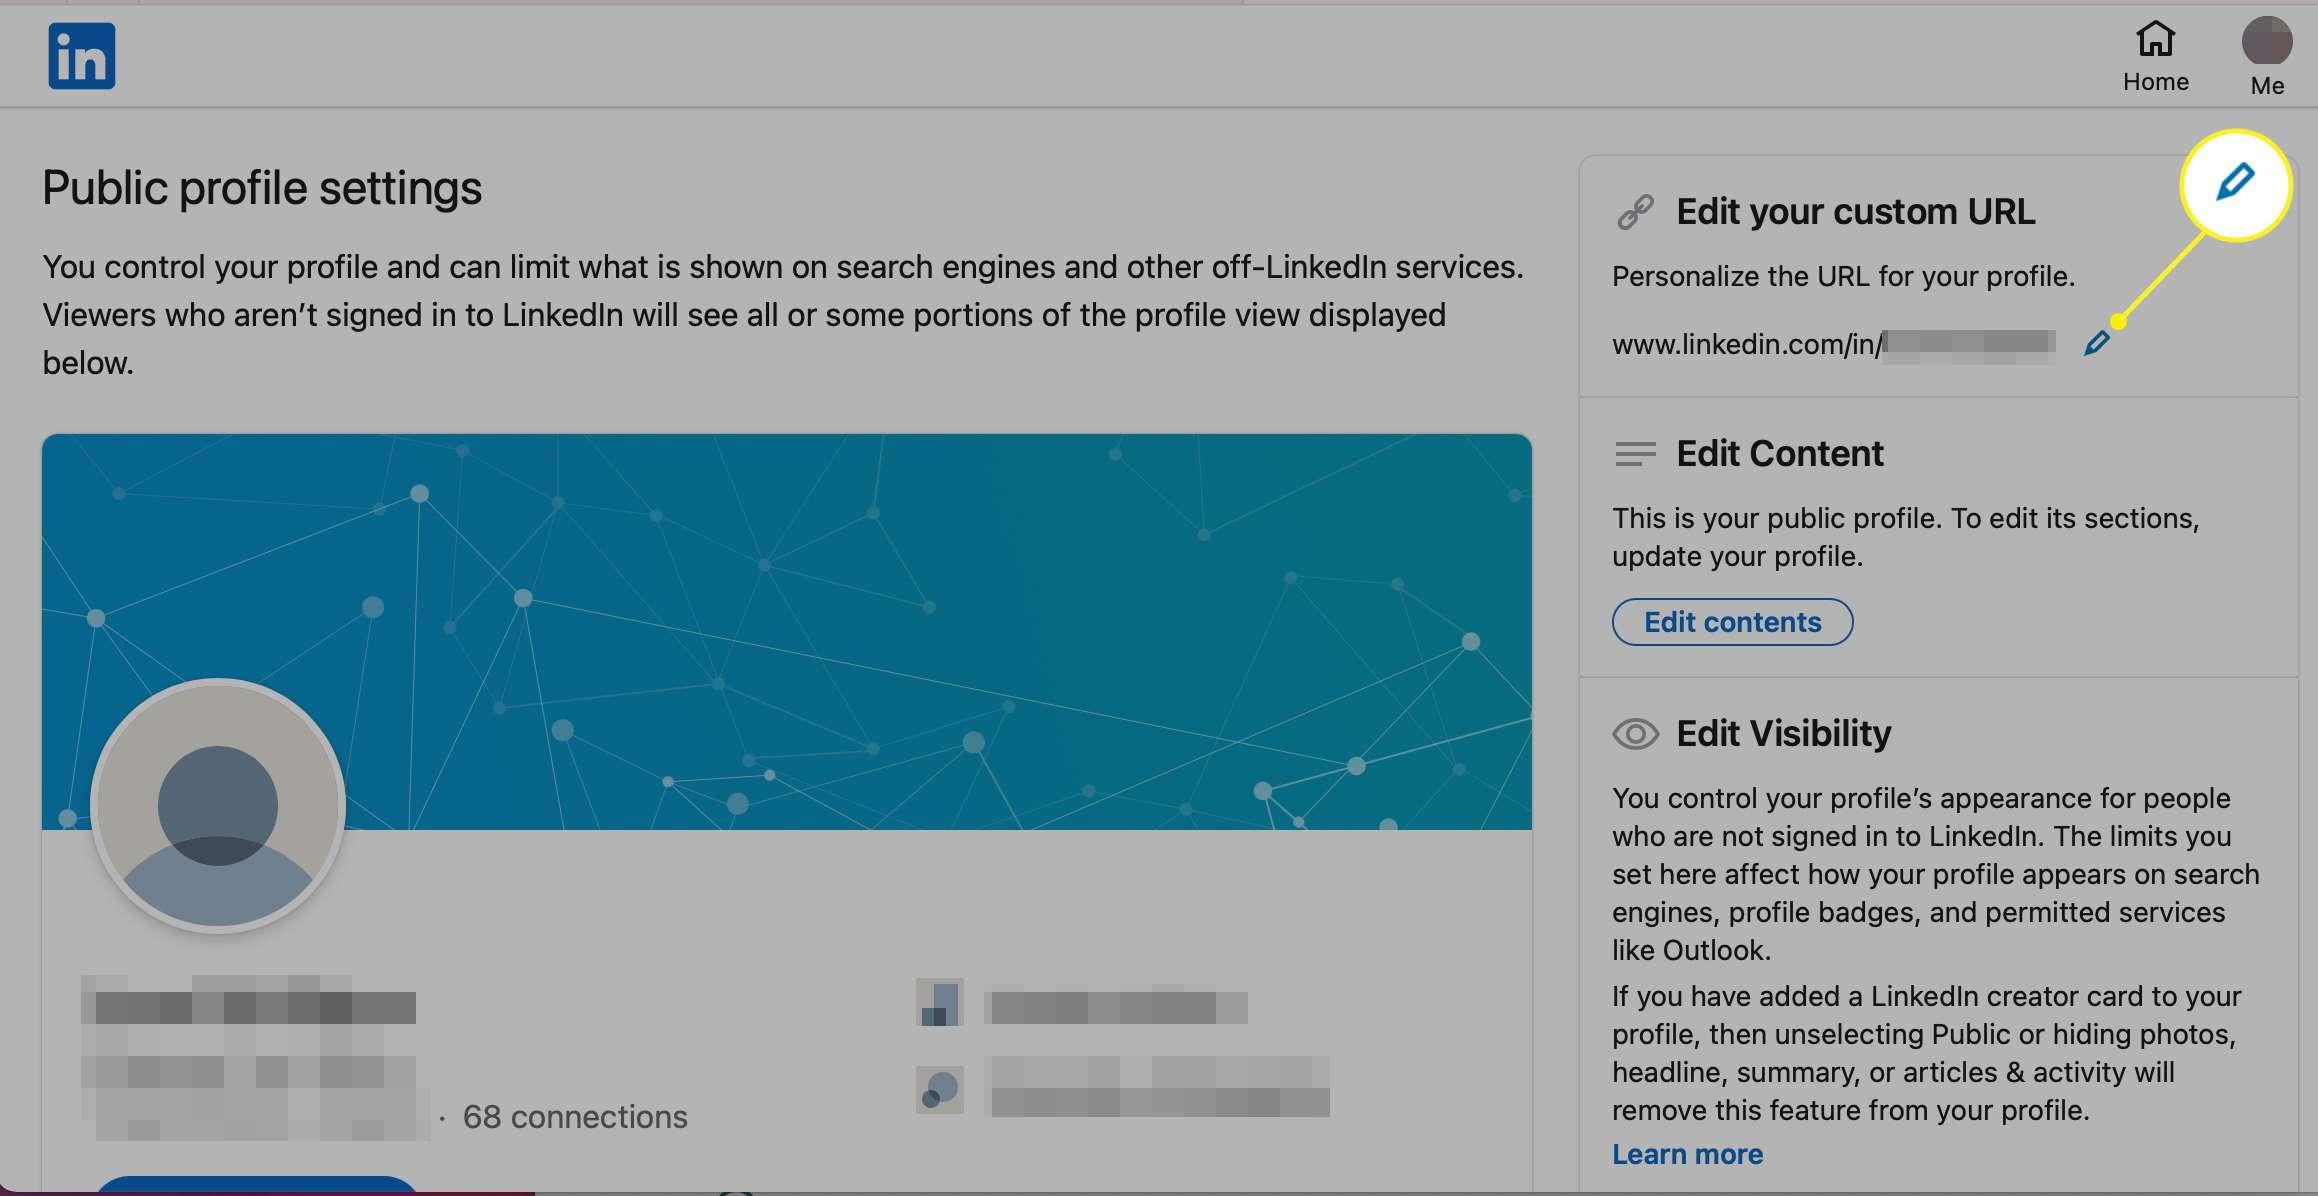 Edit your custom URL field in LinkedIn